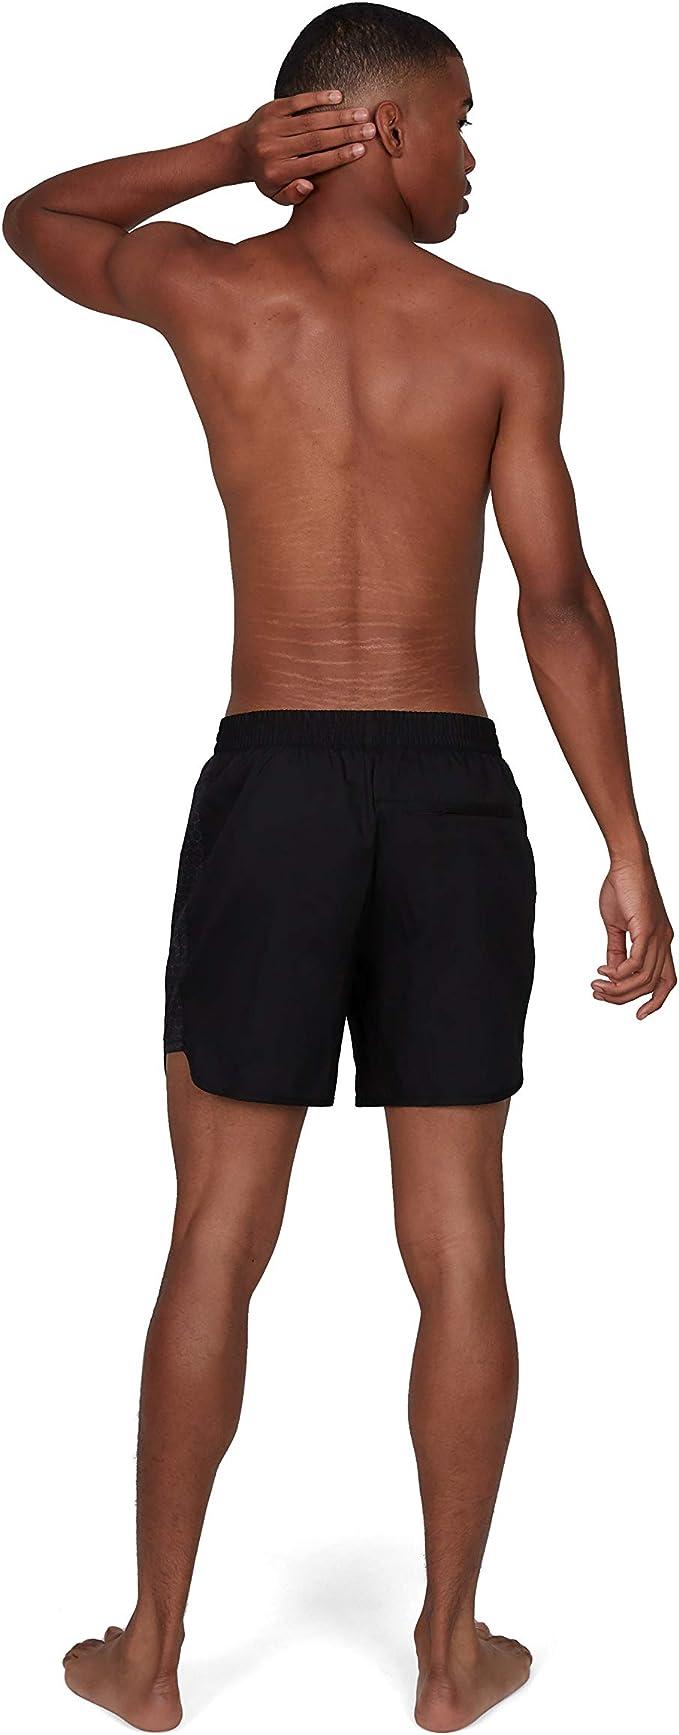 FR : L Noir USA Charcoal Taille Fabricant : L Speedo Short Multi-Sport 16 Bain Homme